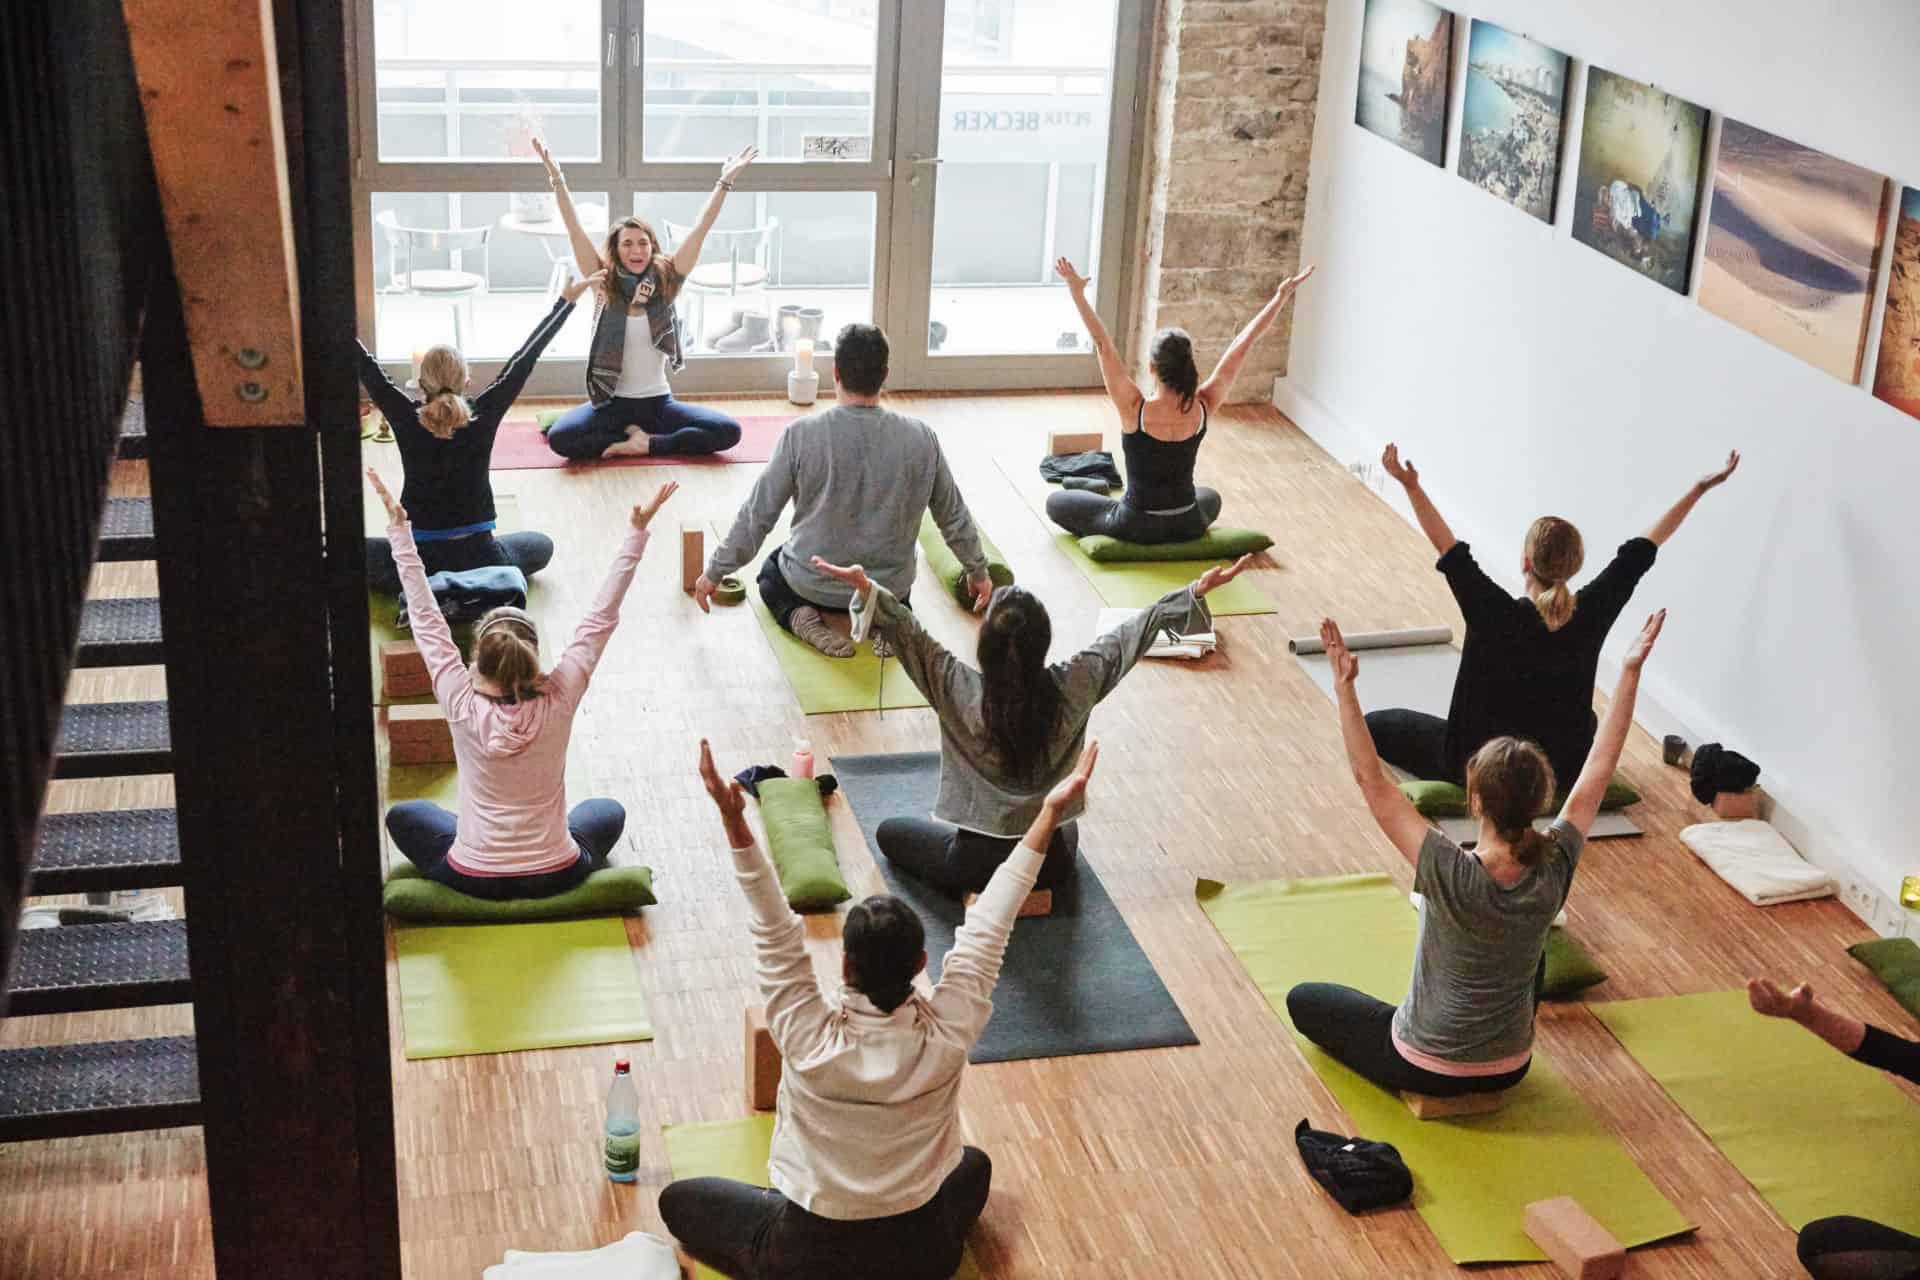 YogaManufaktur_Wuerzburg_Buergerbraeugelaende_Postnatal_yoga_Warm_up